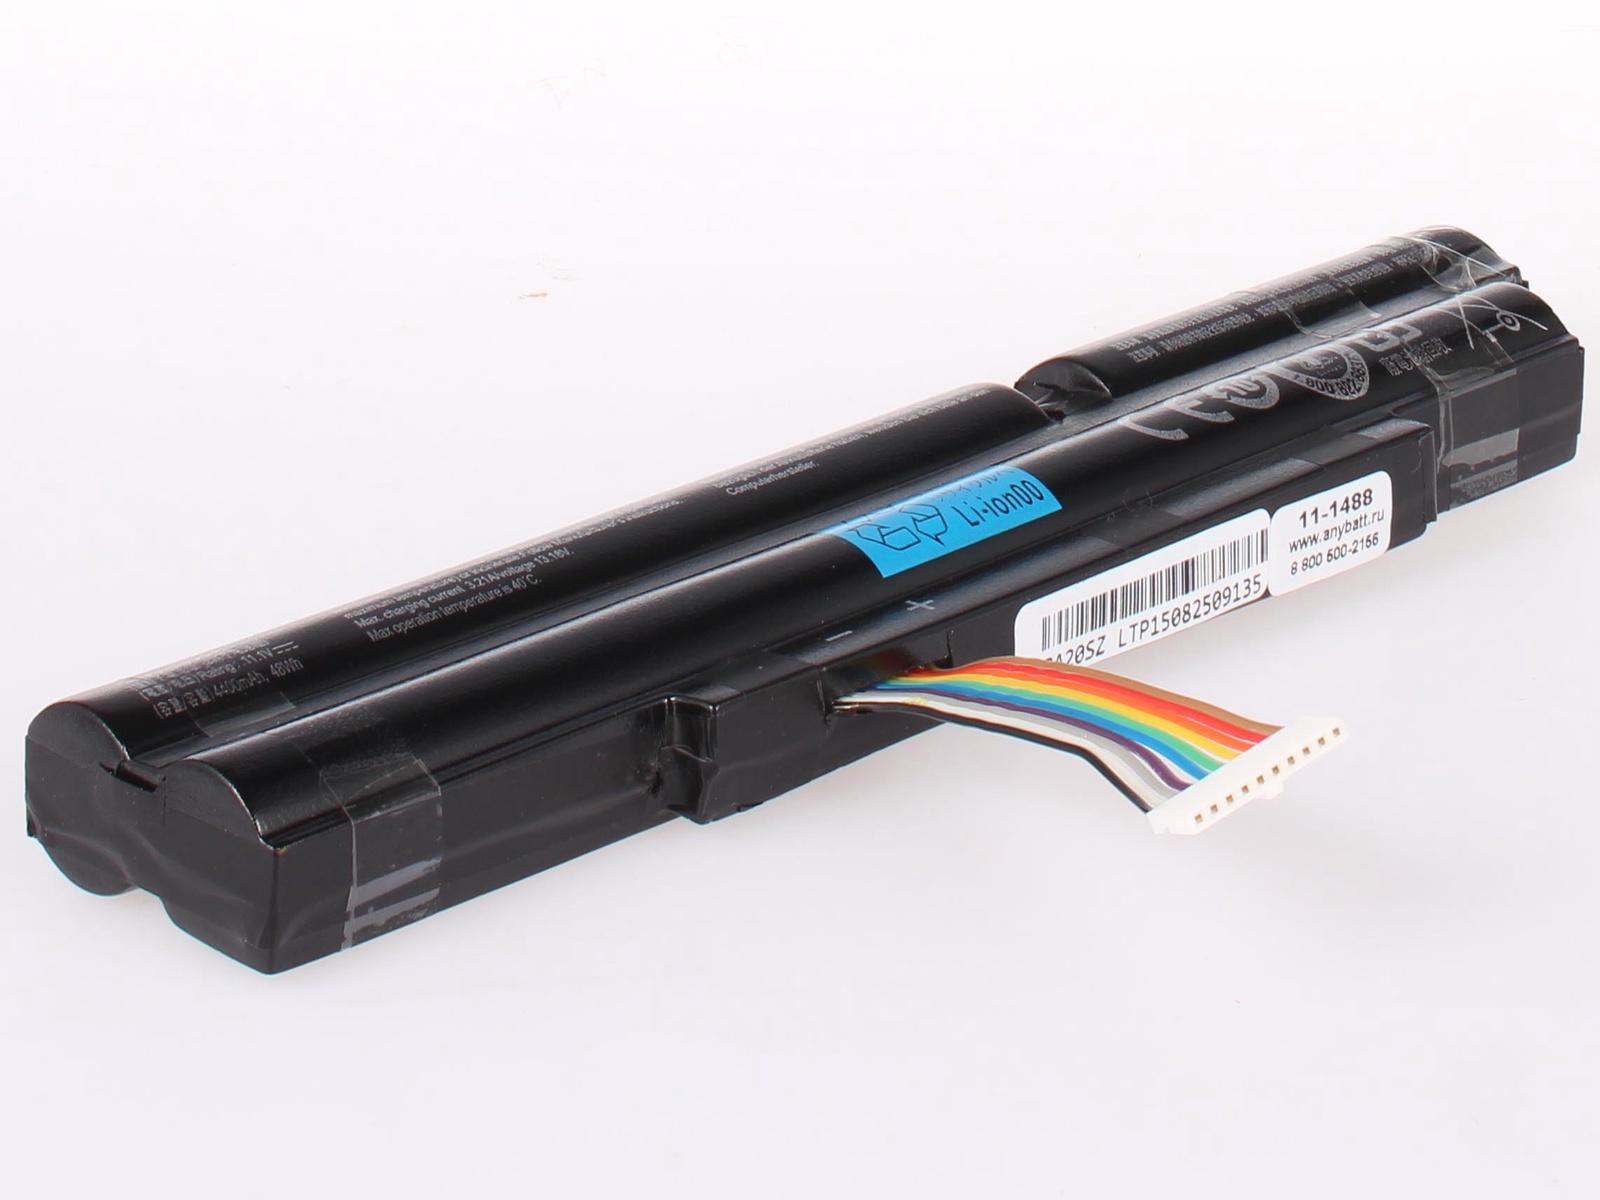 Аккумулятор для ноутбука AnyBatt для Acer Aspire TimelineX 4830TG-2334G50Mnbb, Aspire TimelineX 5830TG-2436G64Mnbb, Aspire 3830TG-2313G50nbb, Aspire 5830TG-2414G64Mnbb, Aspire 4830T-2313G32Mnbb, Aspire TimelineX 4830T-2313G32Mnbb цена